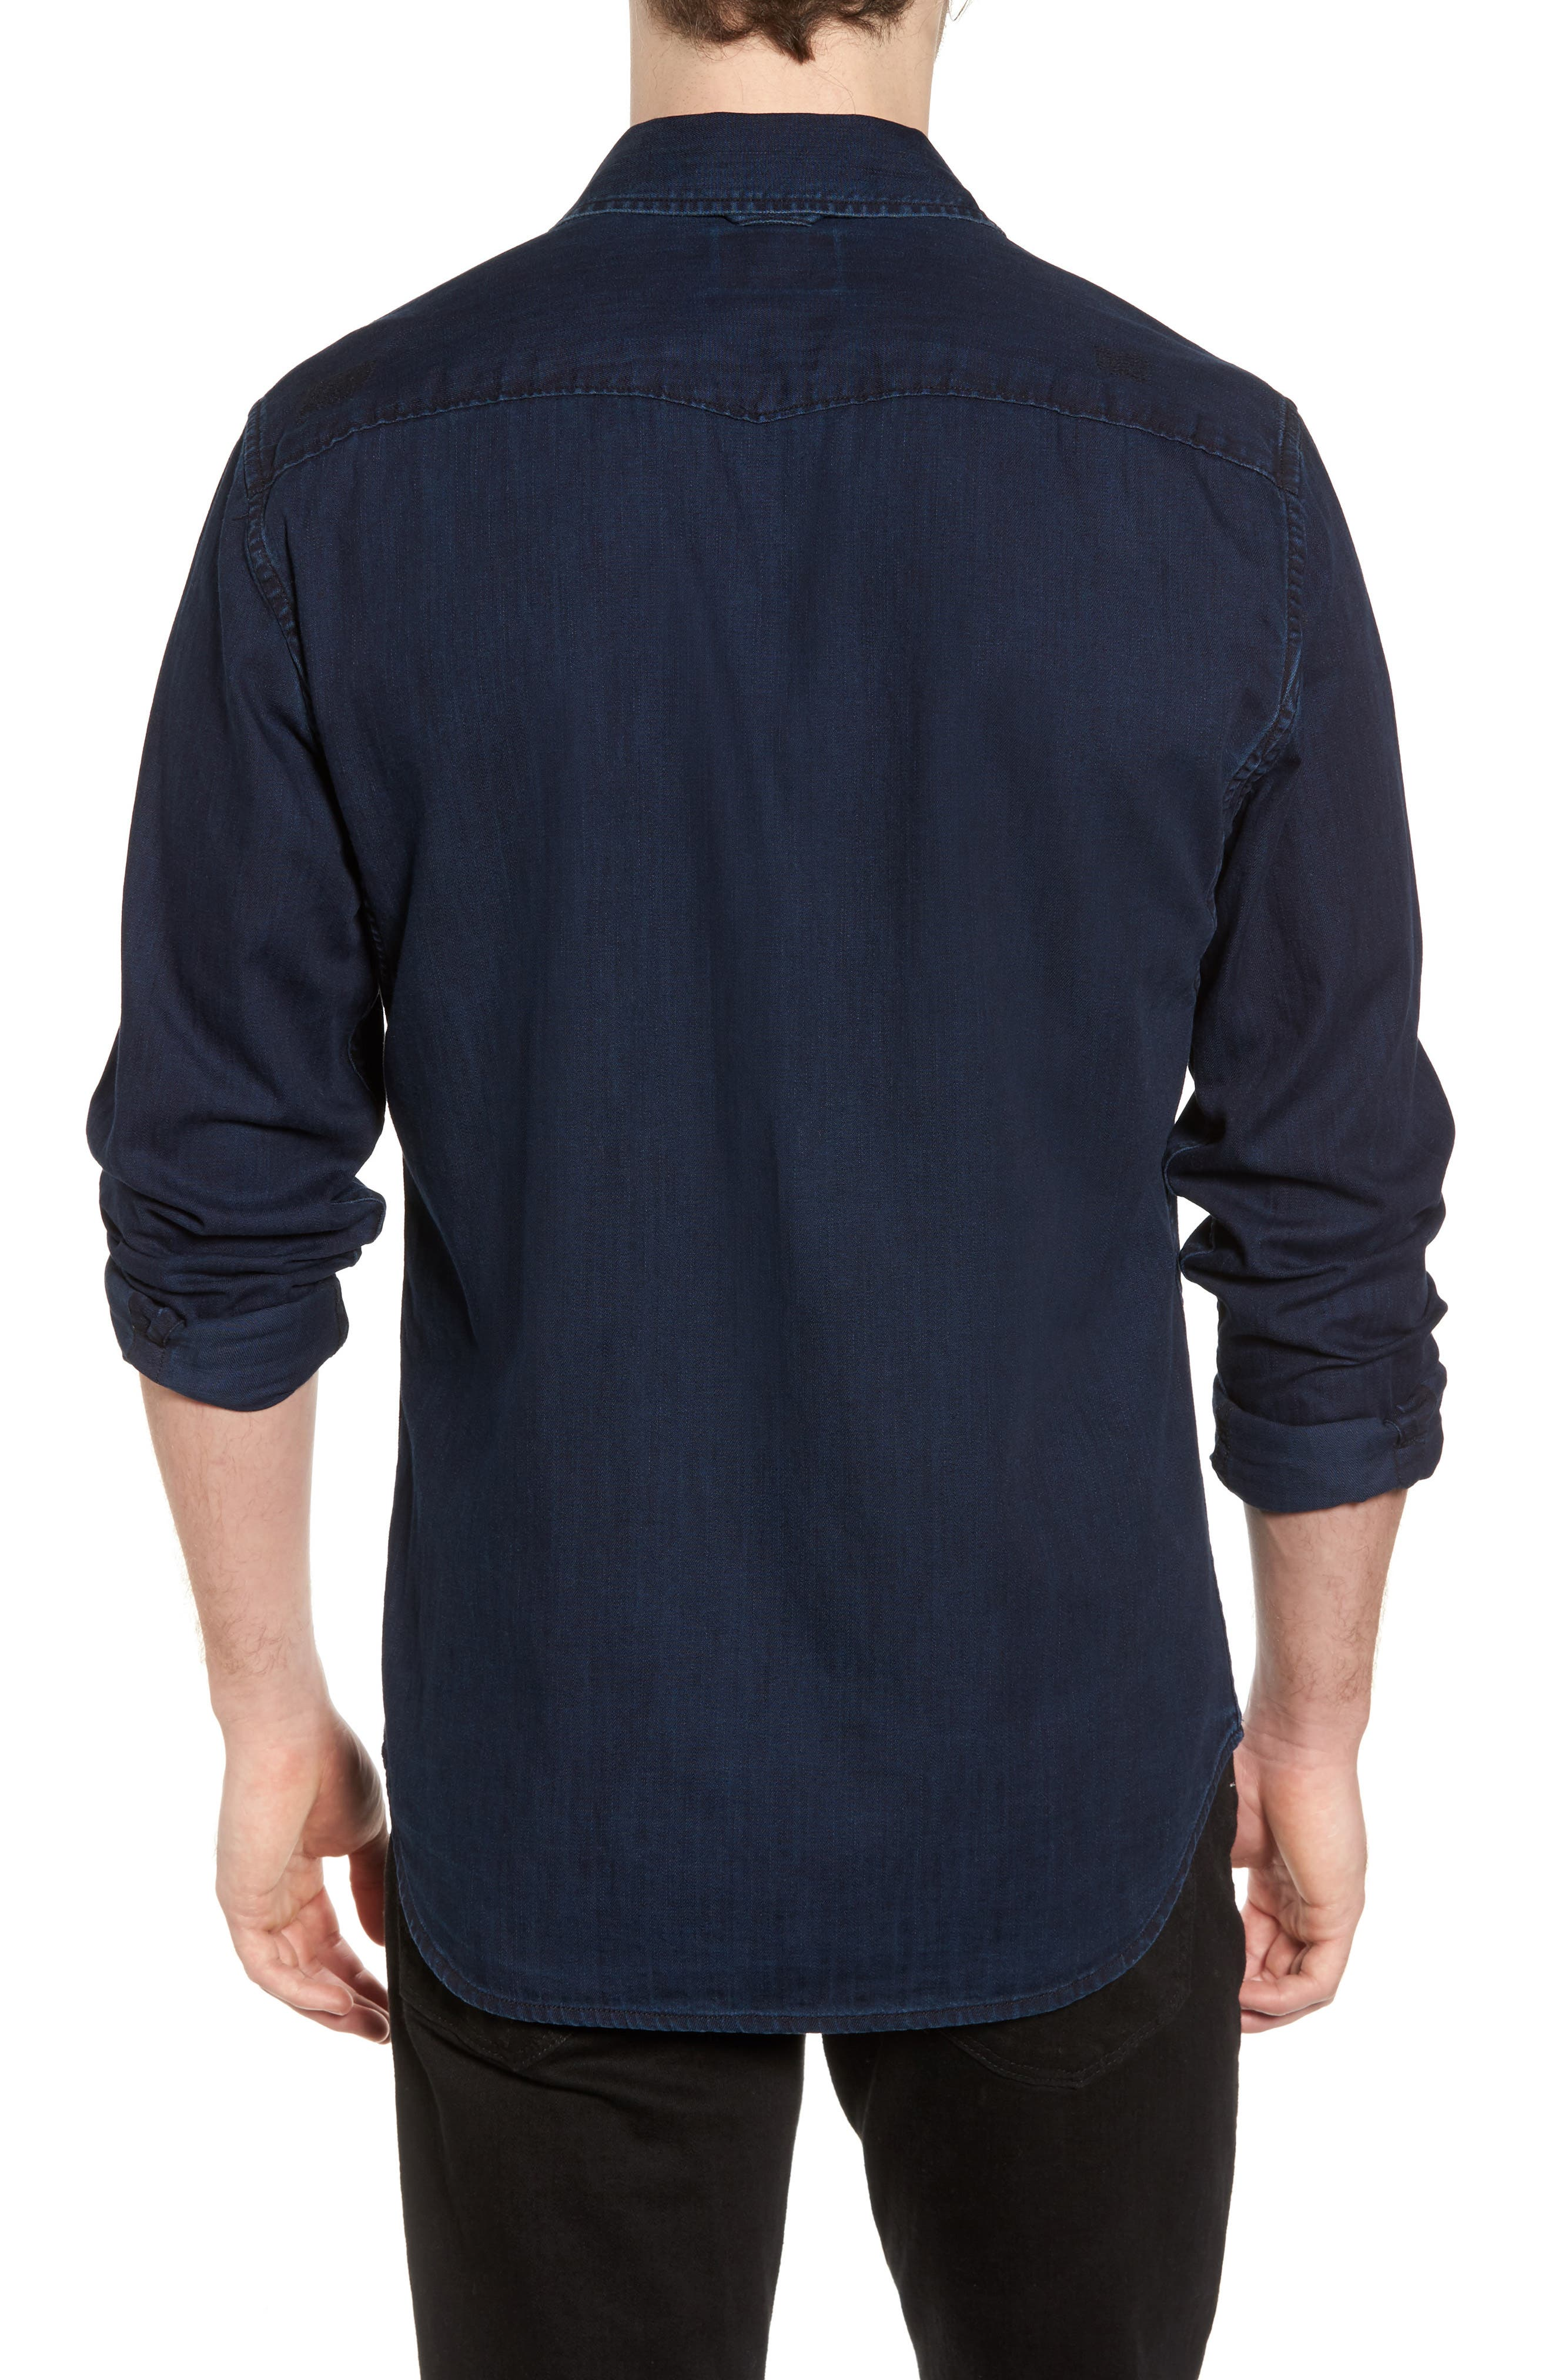 Pocketless Western Denim Shirt,                             Alternate thumbnail 2, color,                             Midnight